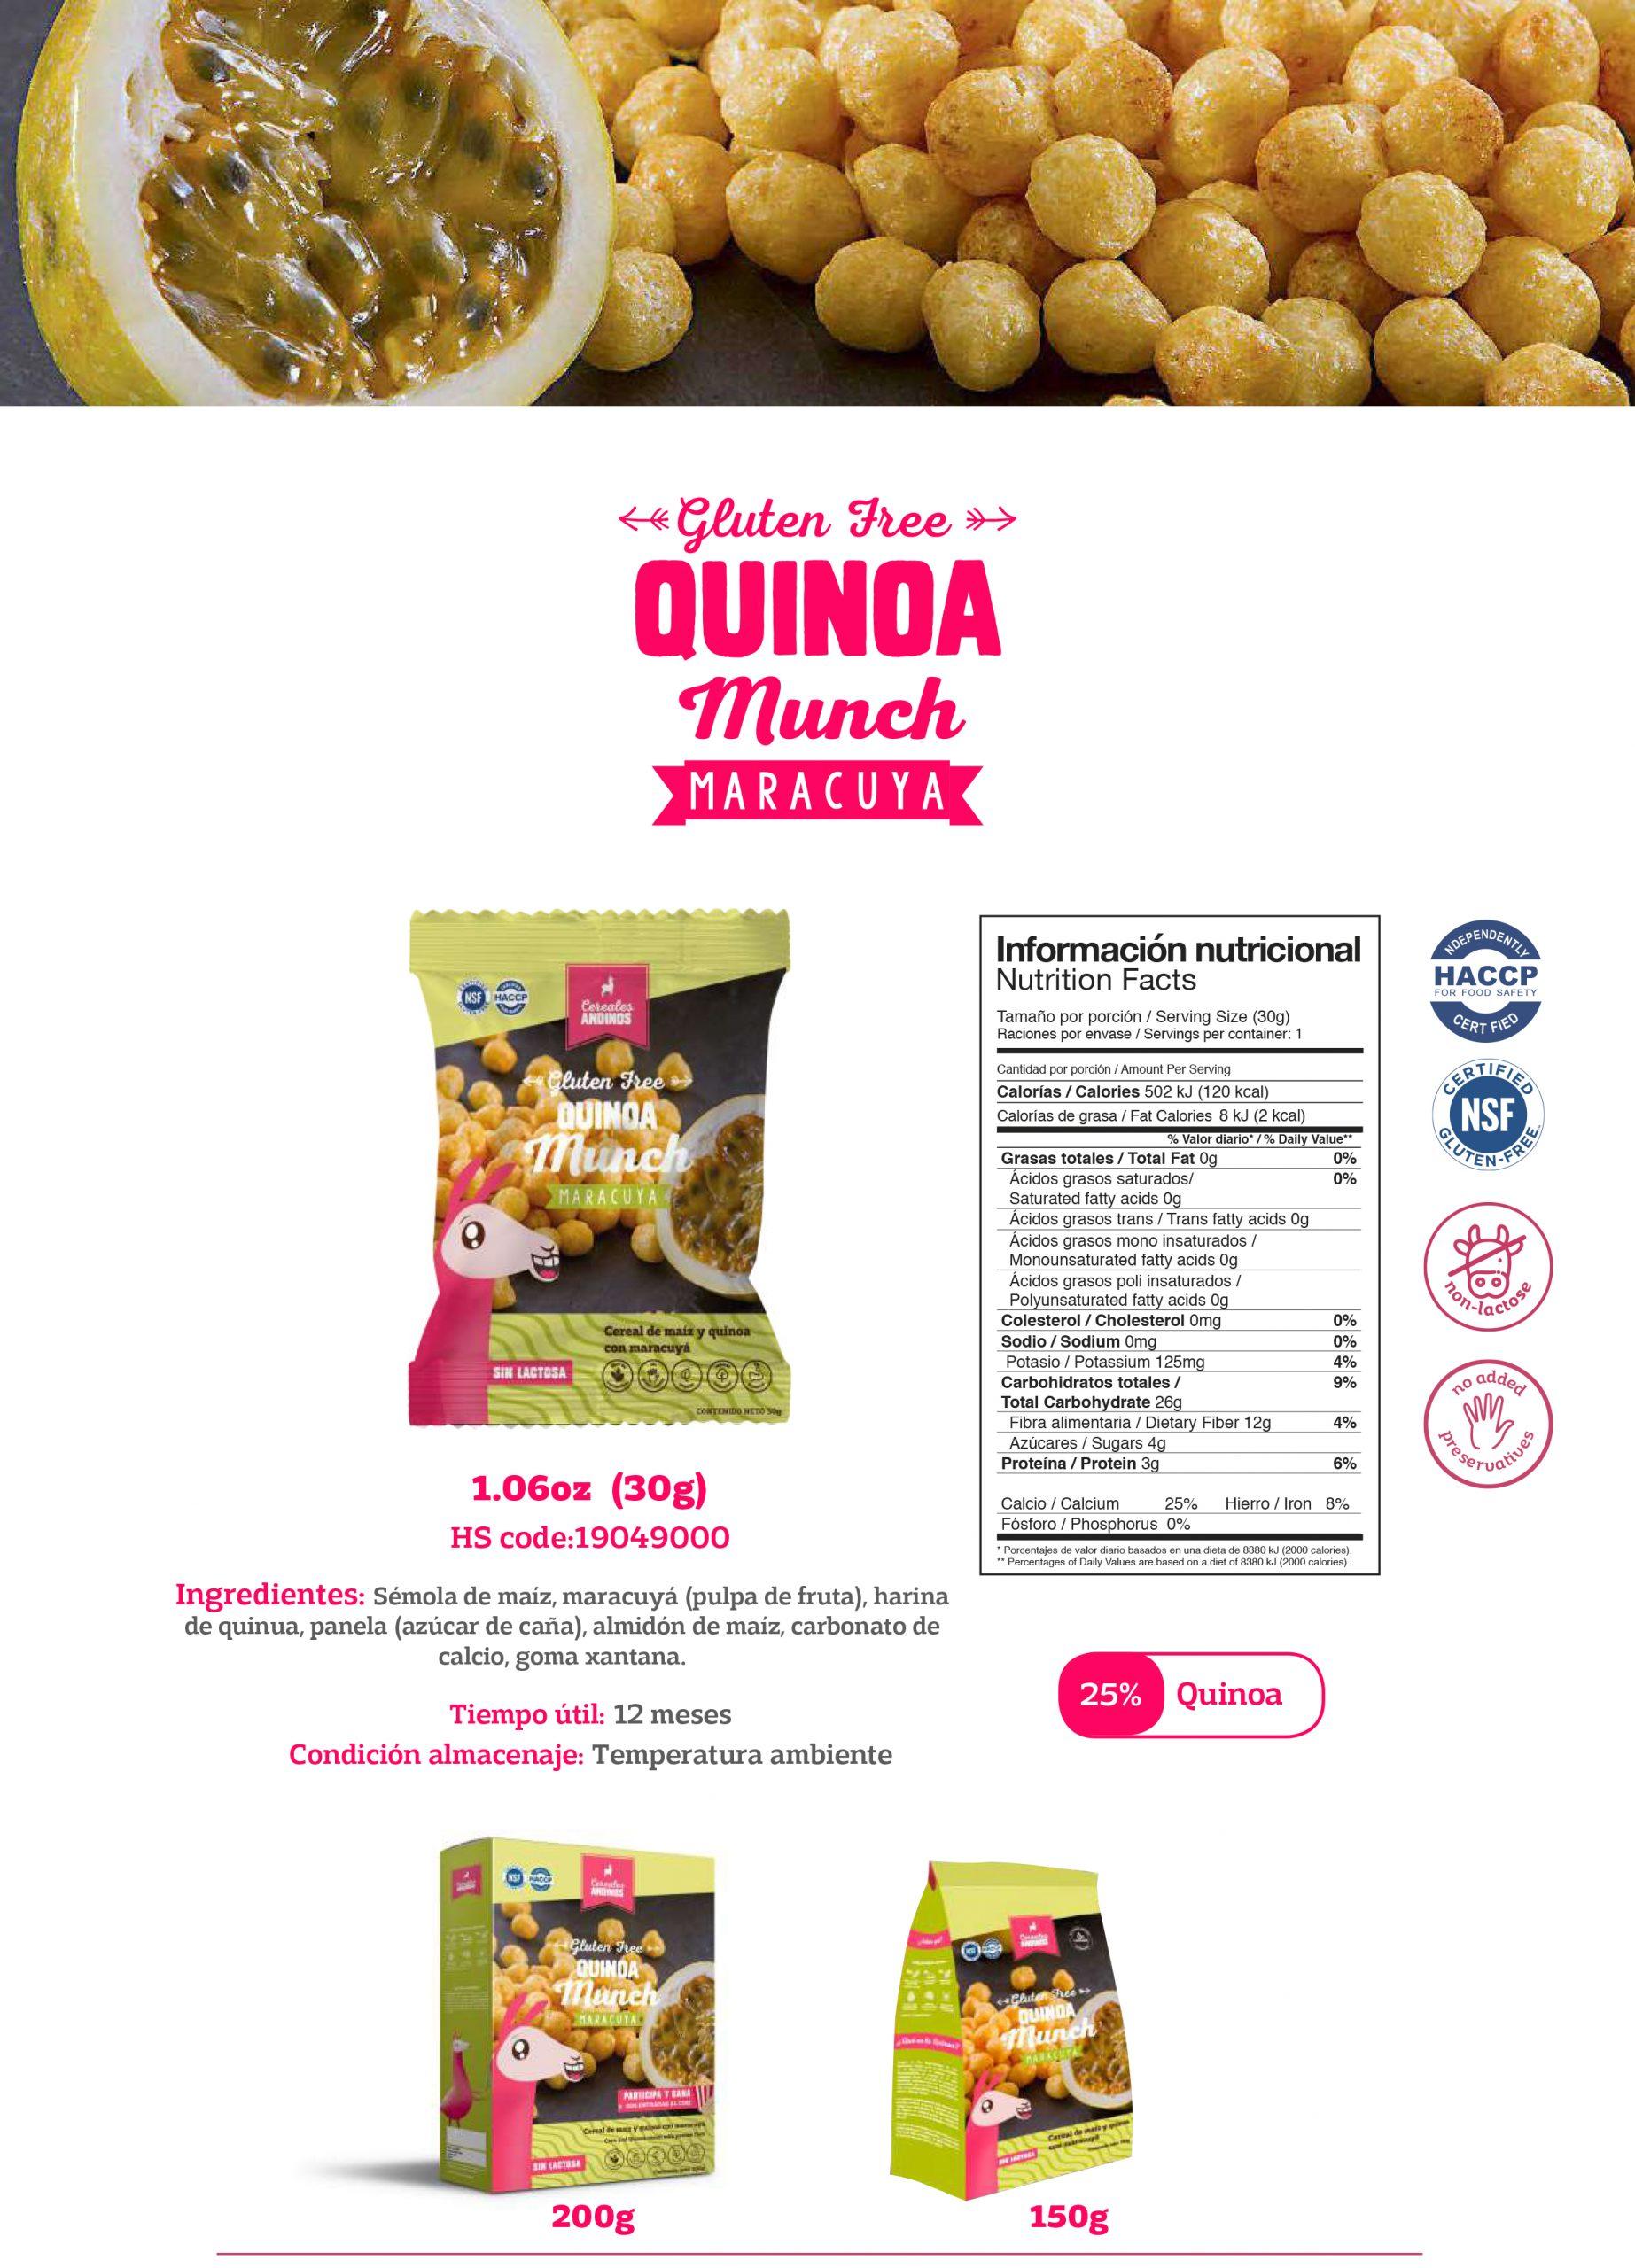 Productos a base de Quinua